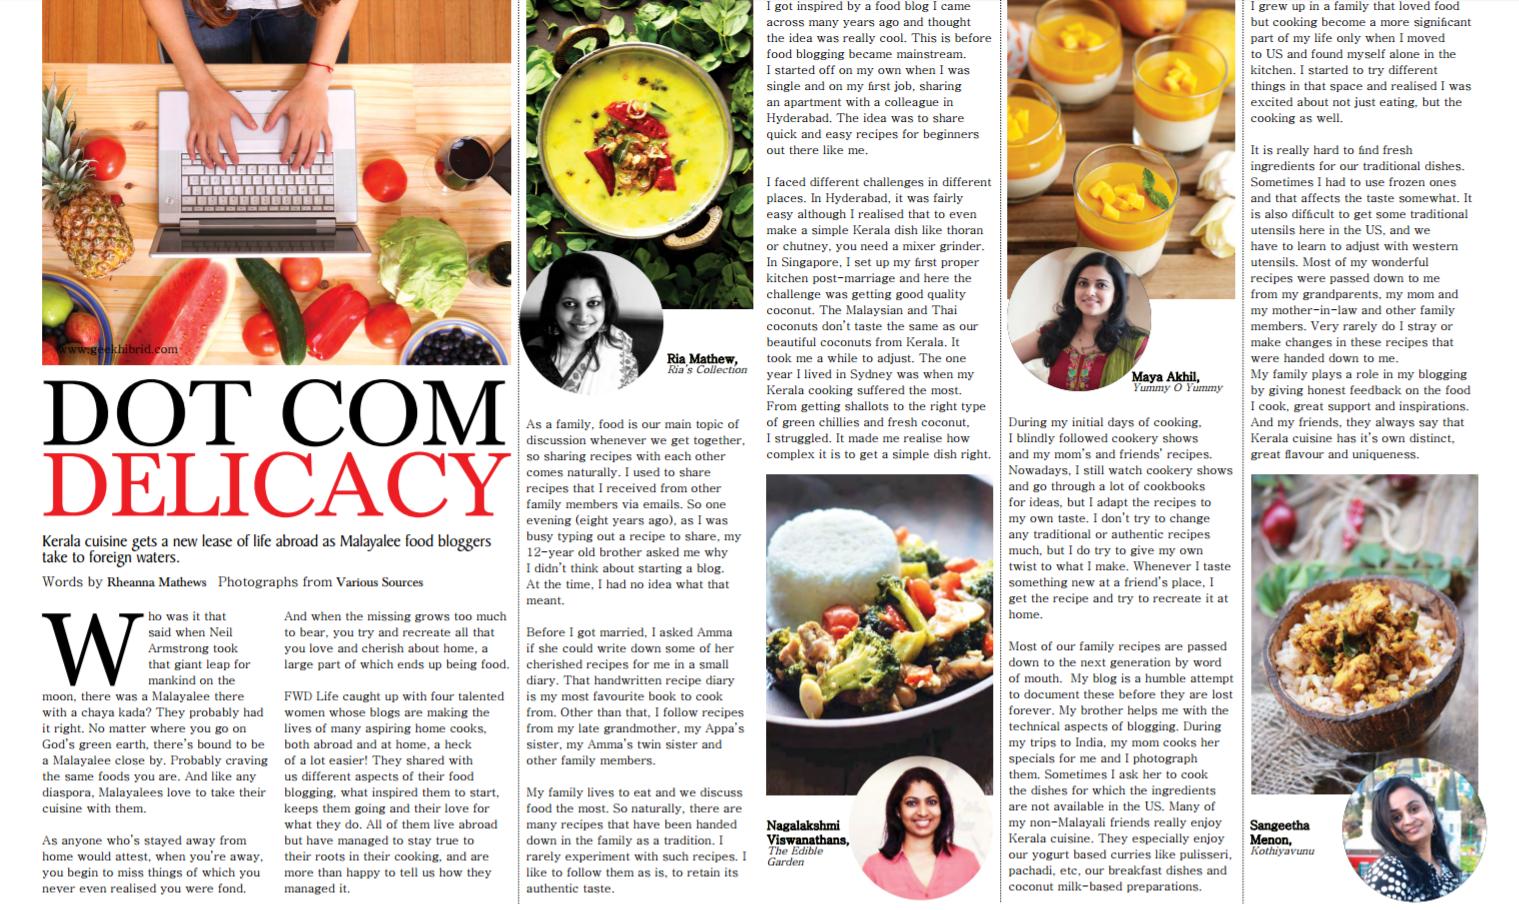 Me on FWD Life magazine |kothiyavunu.com